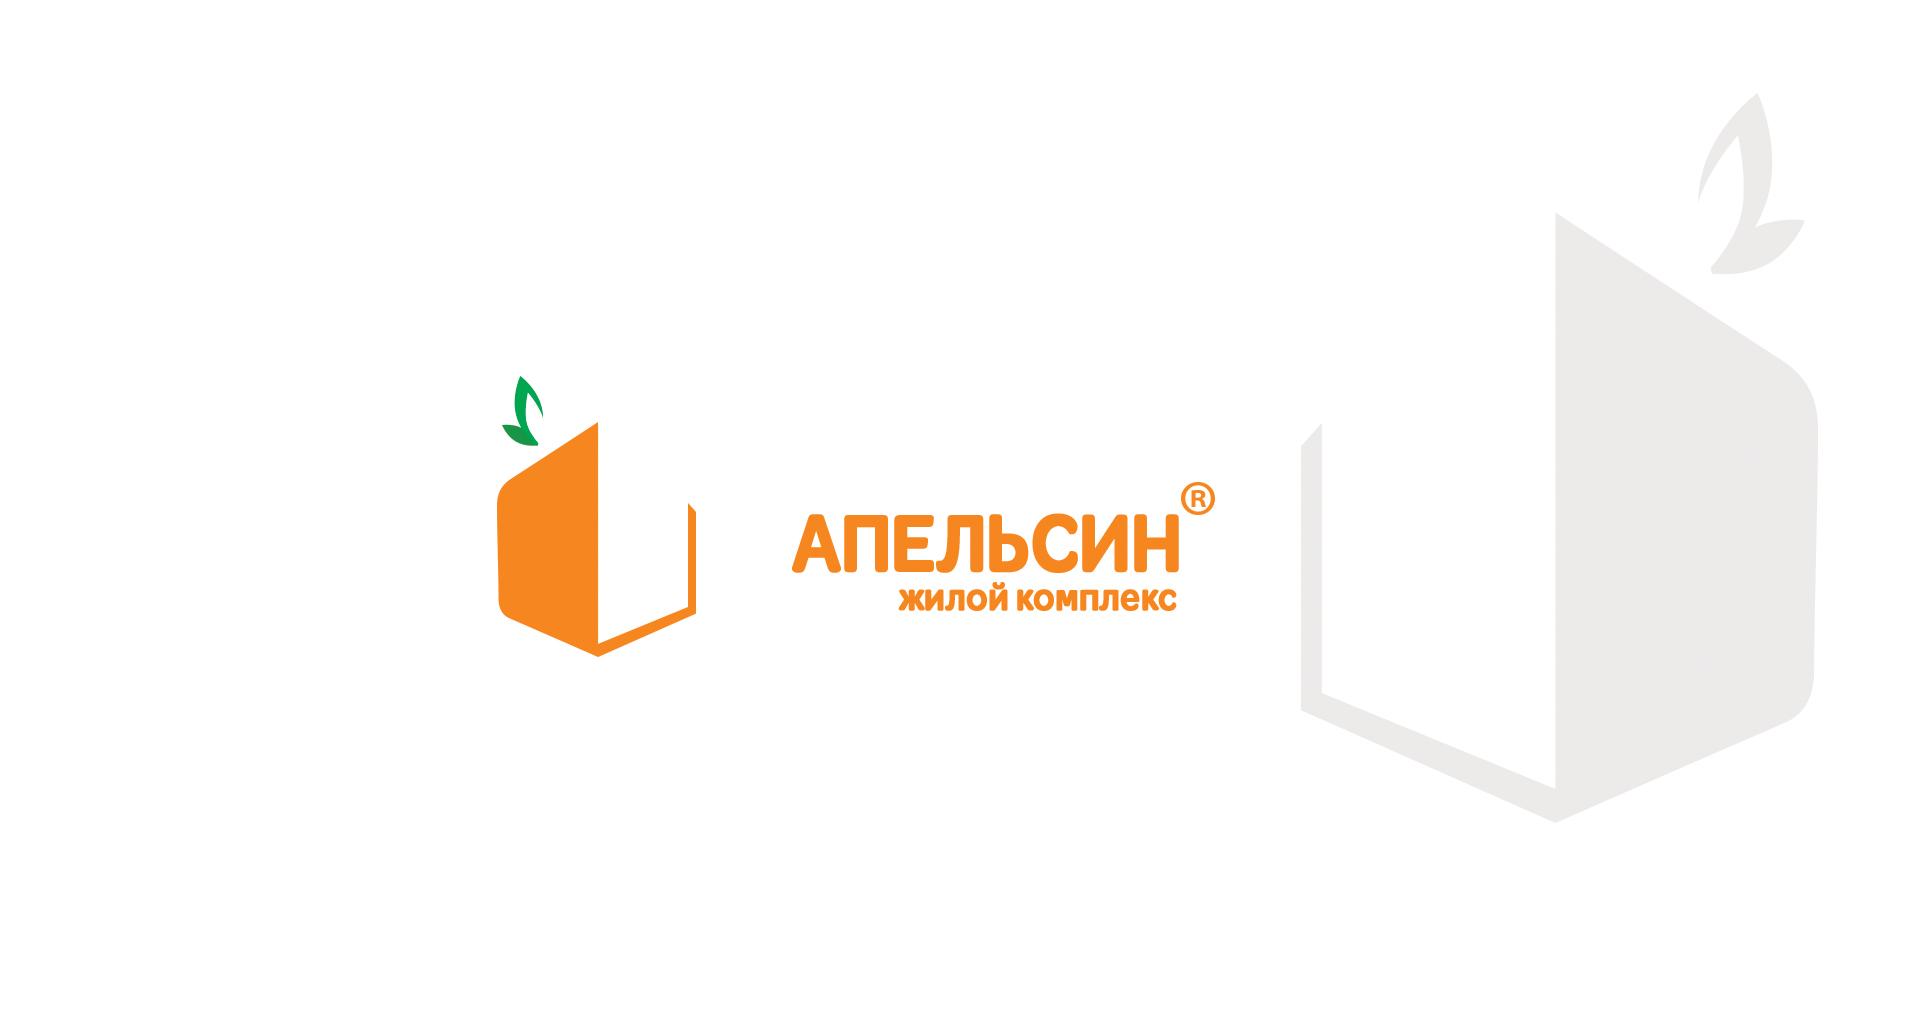 Логотип и фирменный стиль фото f_7445a6131195510b.jpg